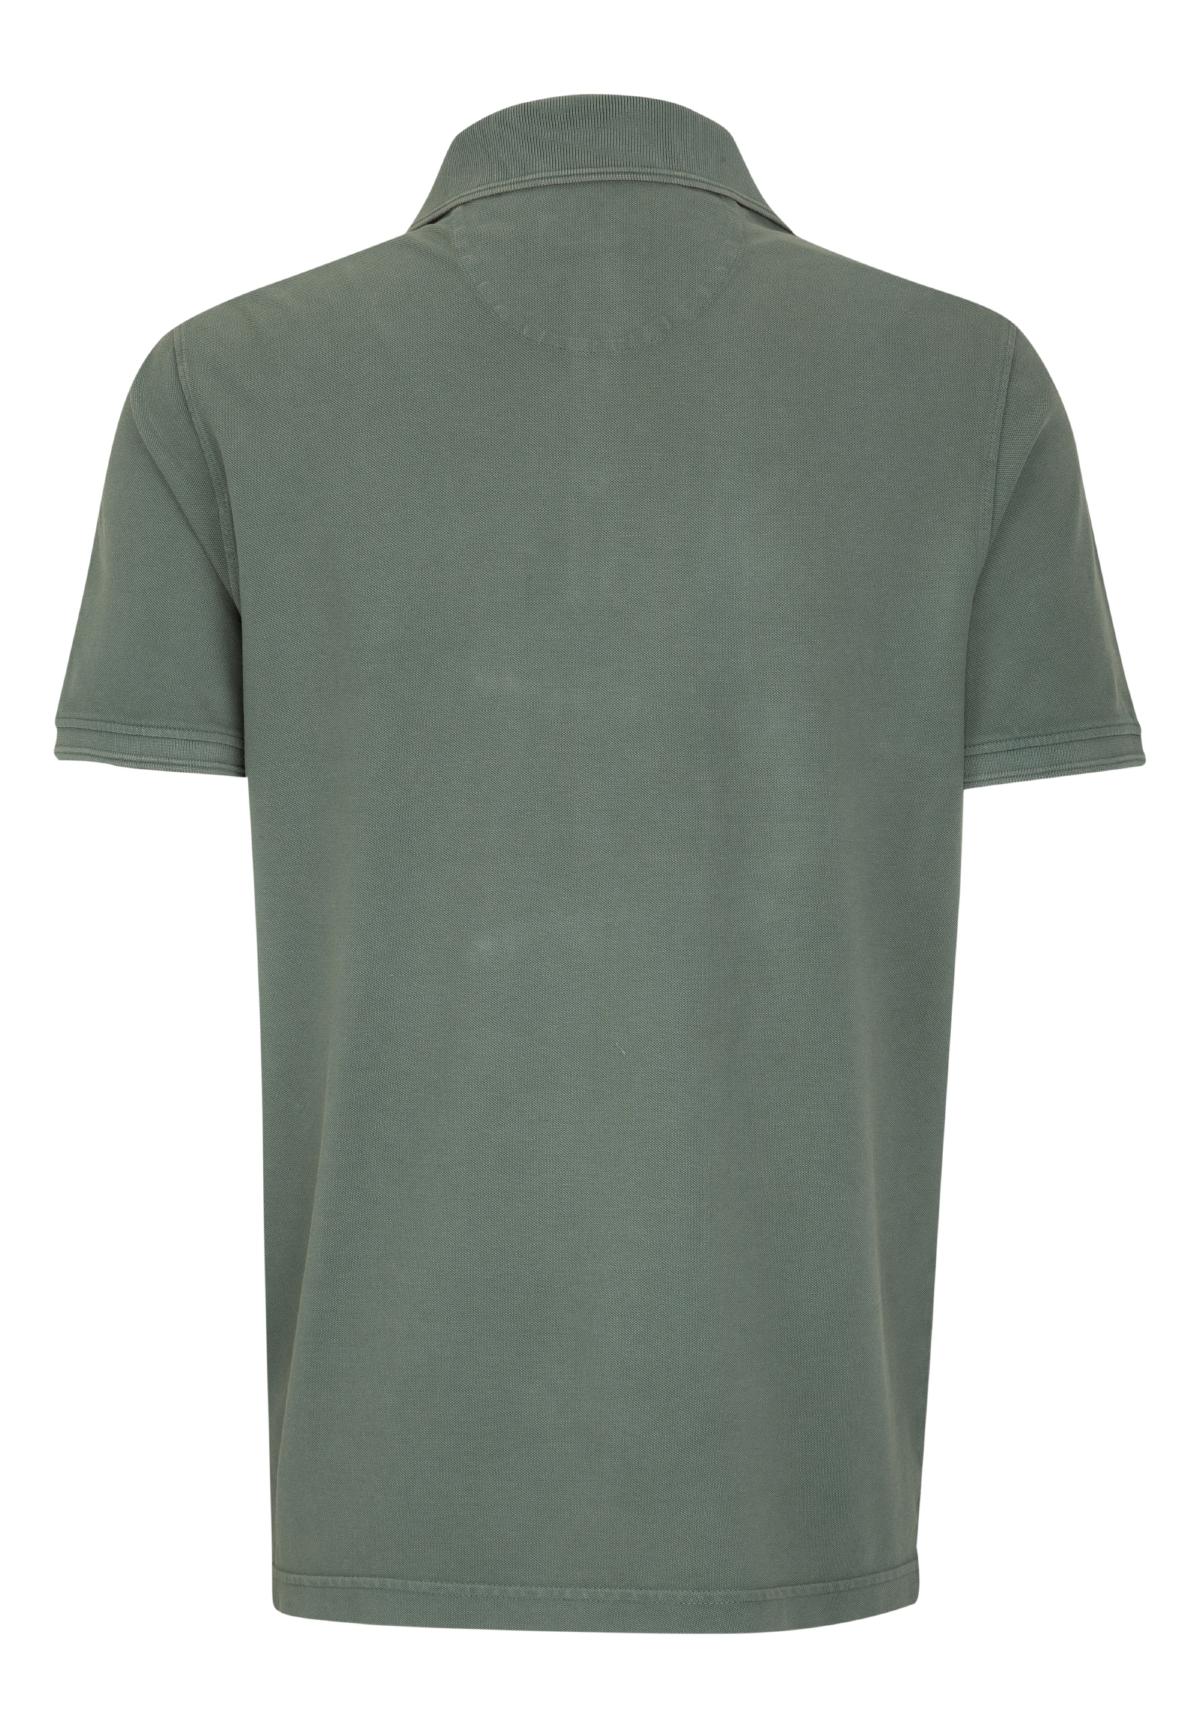 Camel-Active-Herren-Shirt-Poloshirt-Pique-Regular-Fit-NEU Indexbild 83